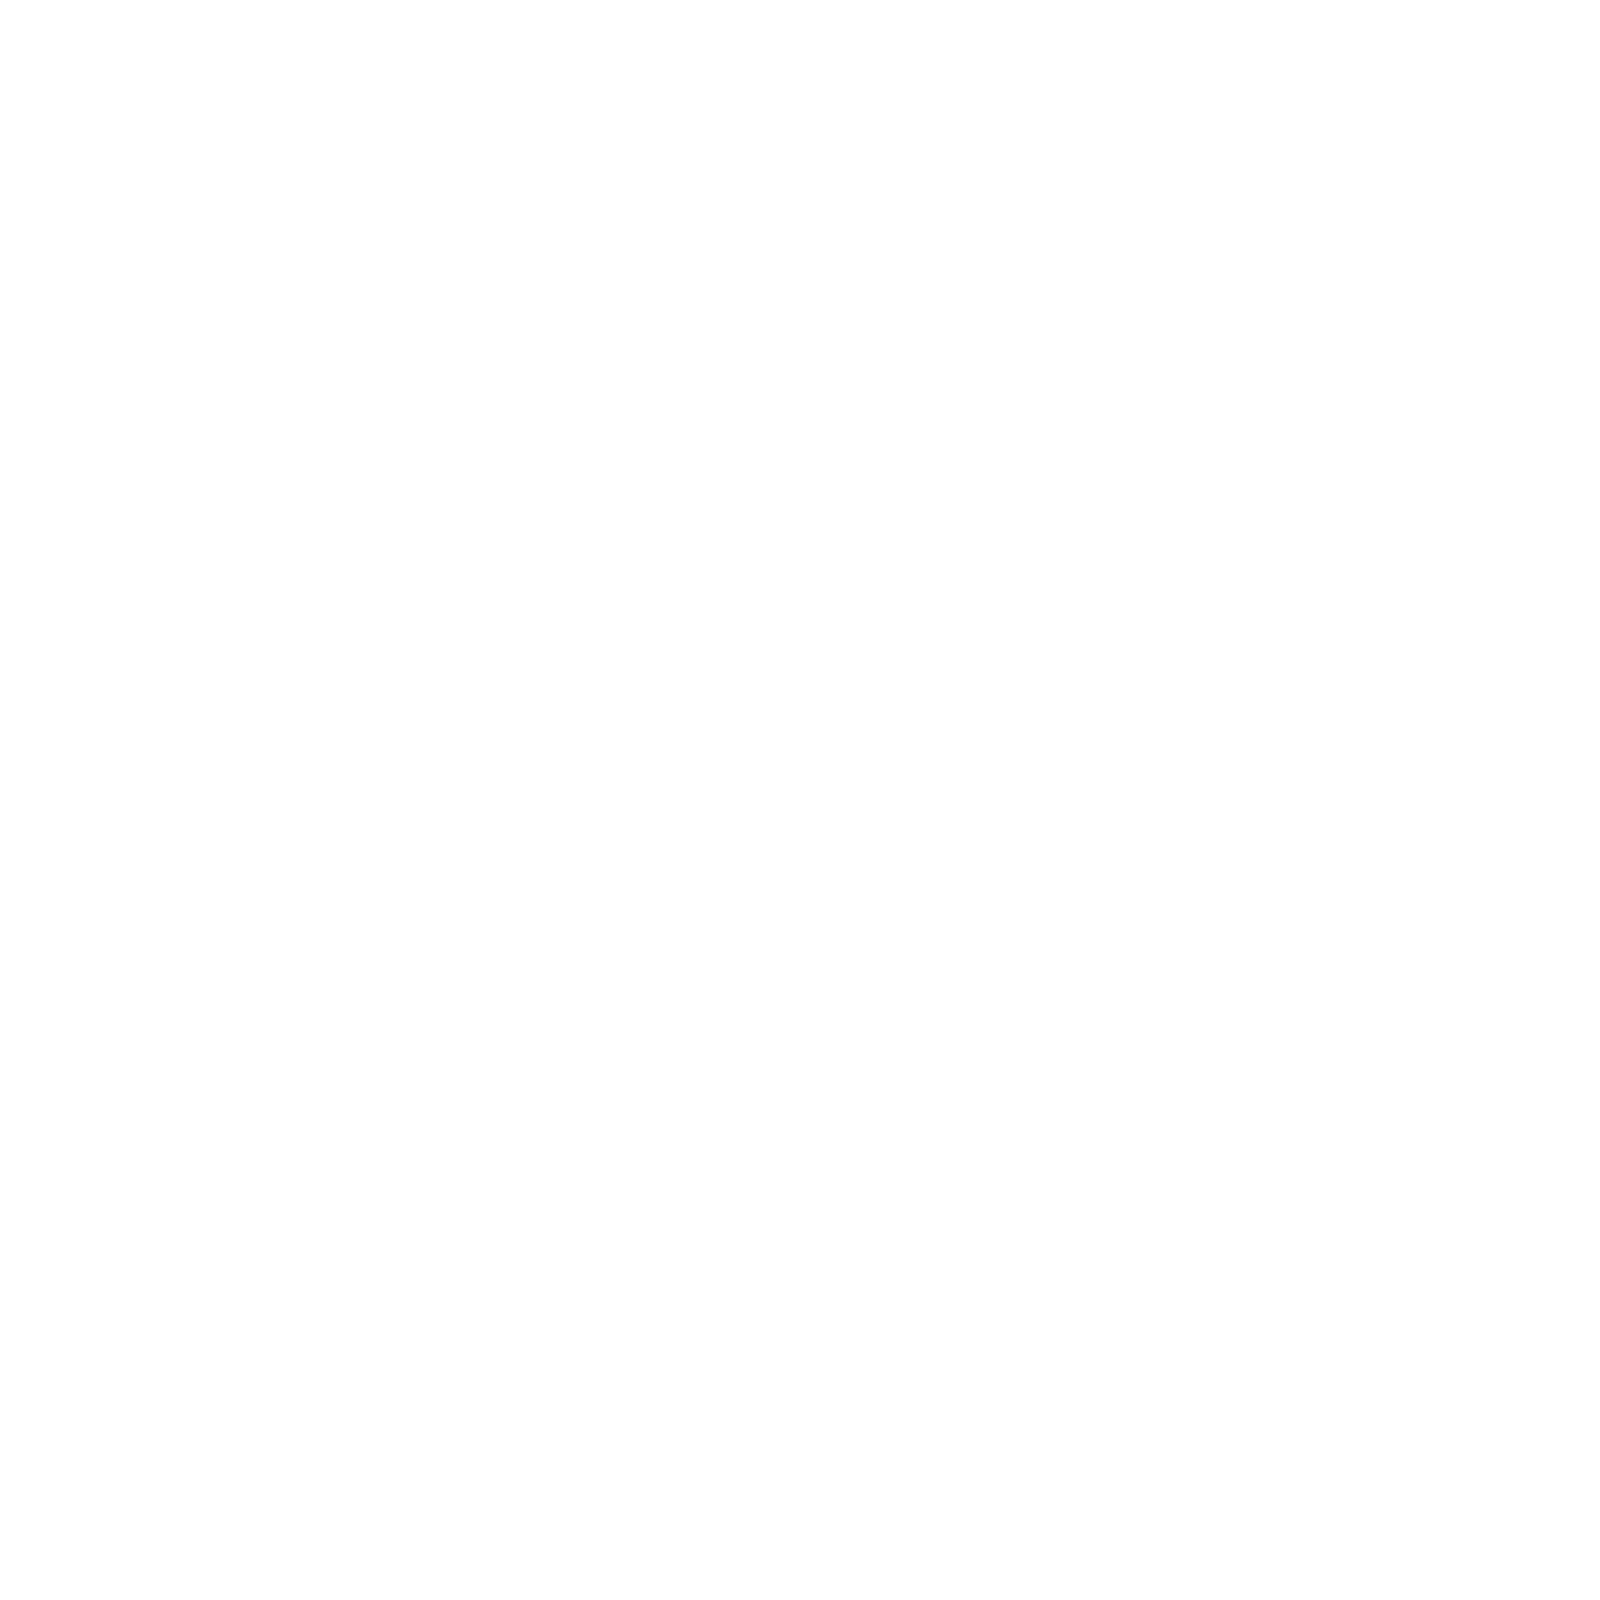 coreldraw 2017 download gratis em portugues completo com serial